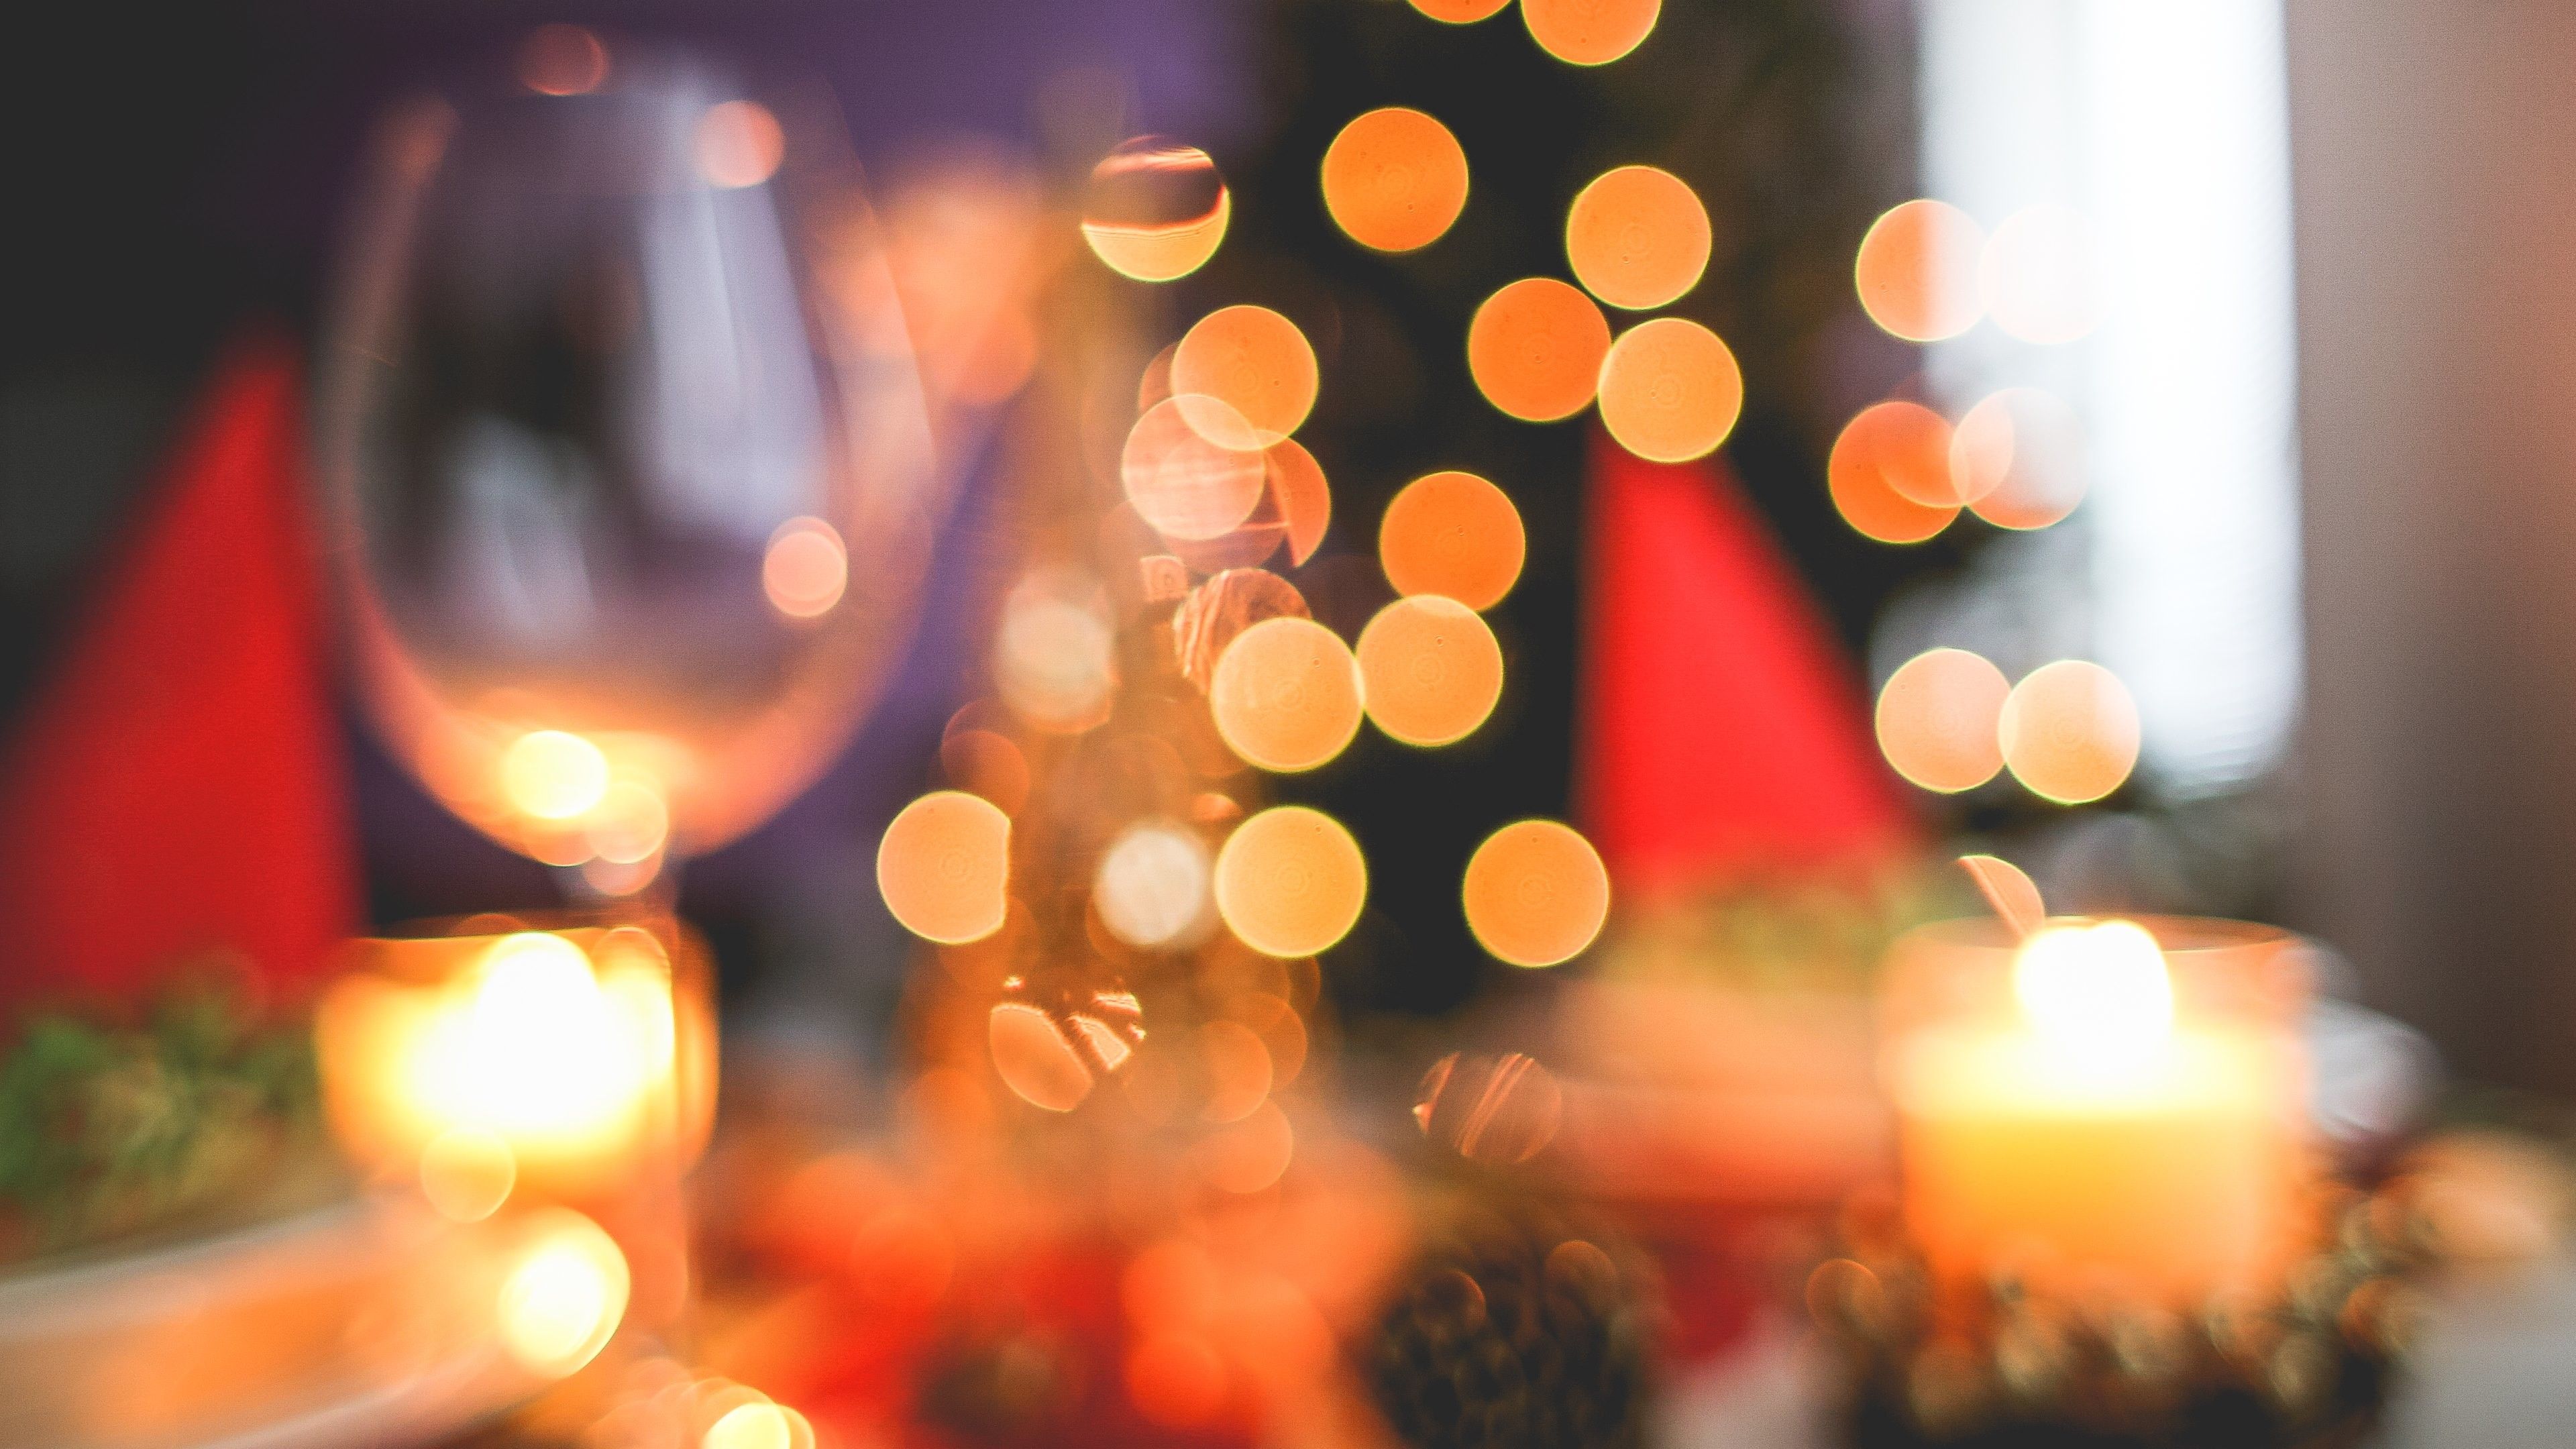 Wallpaper: Blurred Christmas Tree